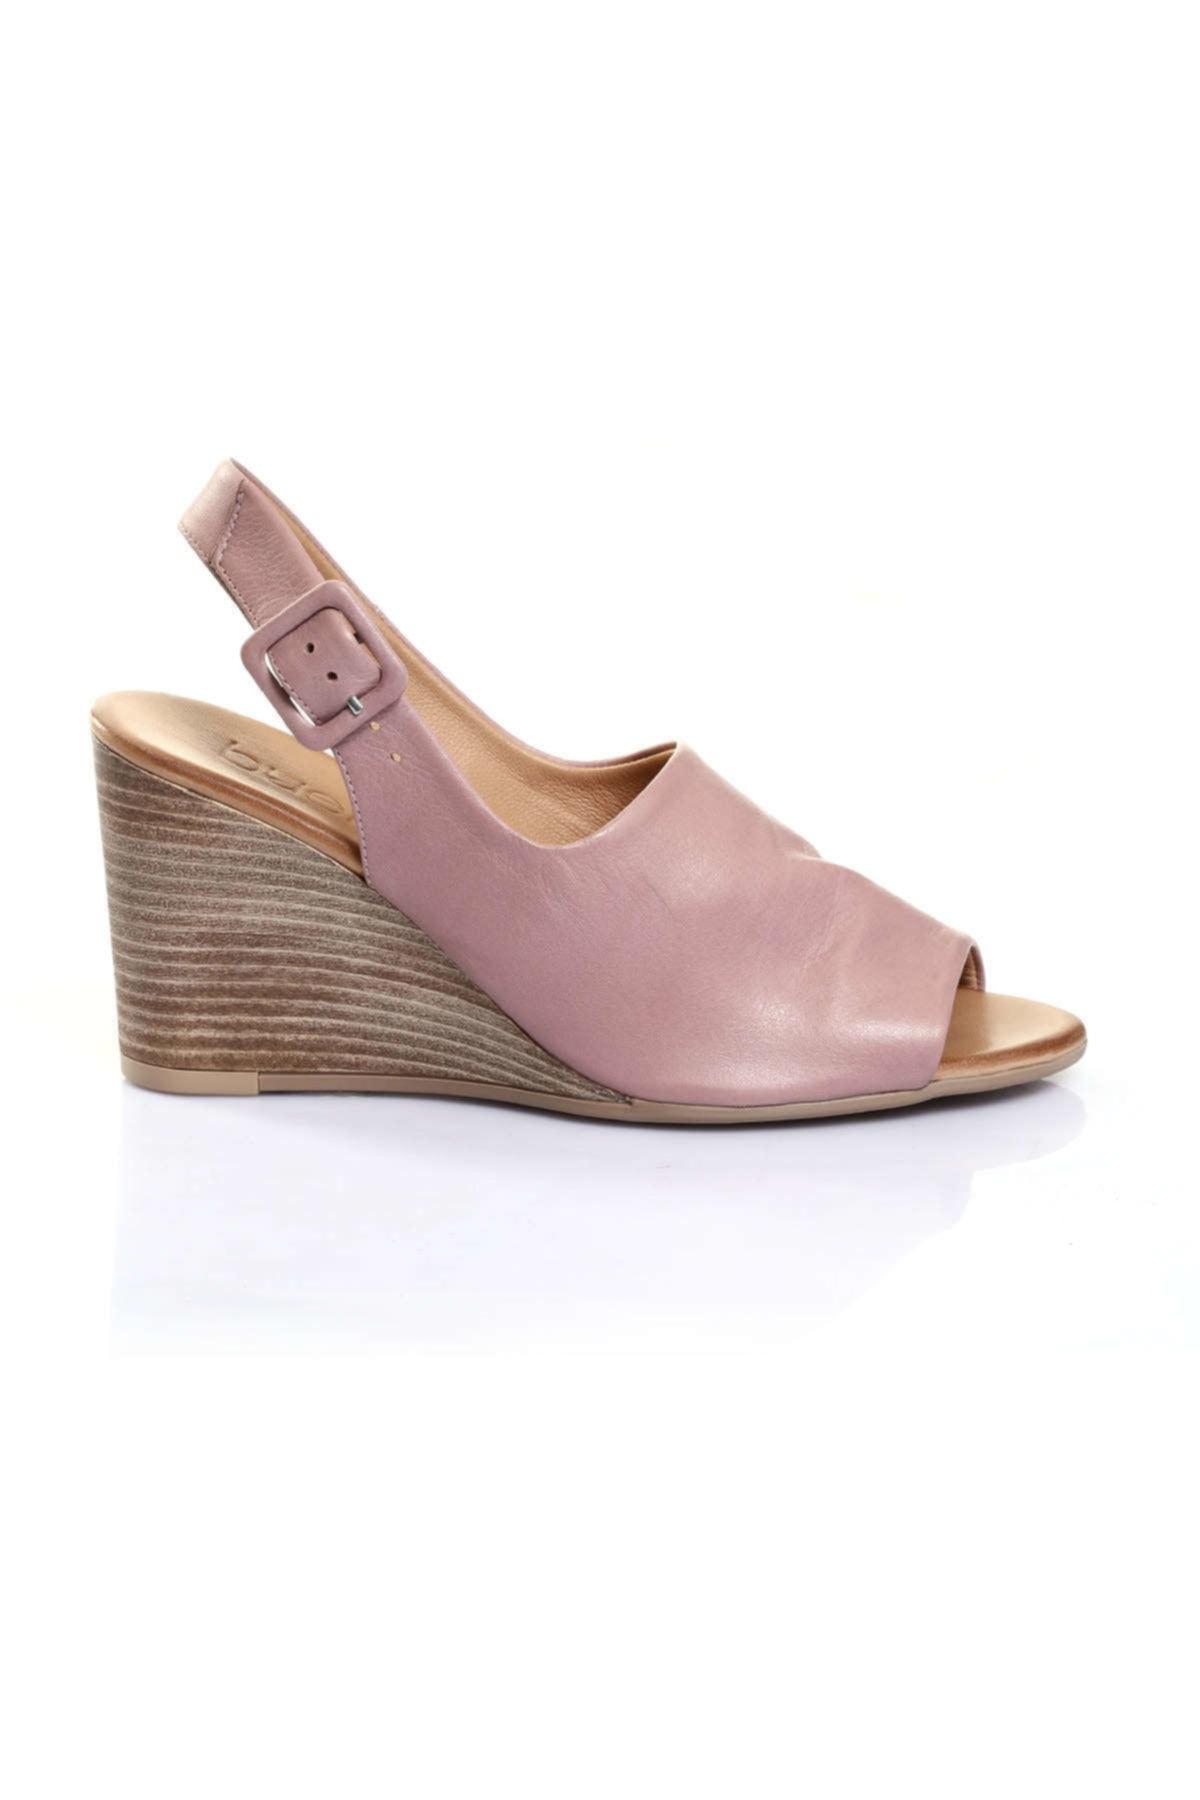 BUENO Shoes Bej Bayan Sandalet 9n1407 2